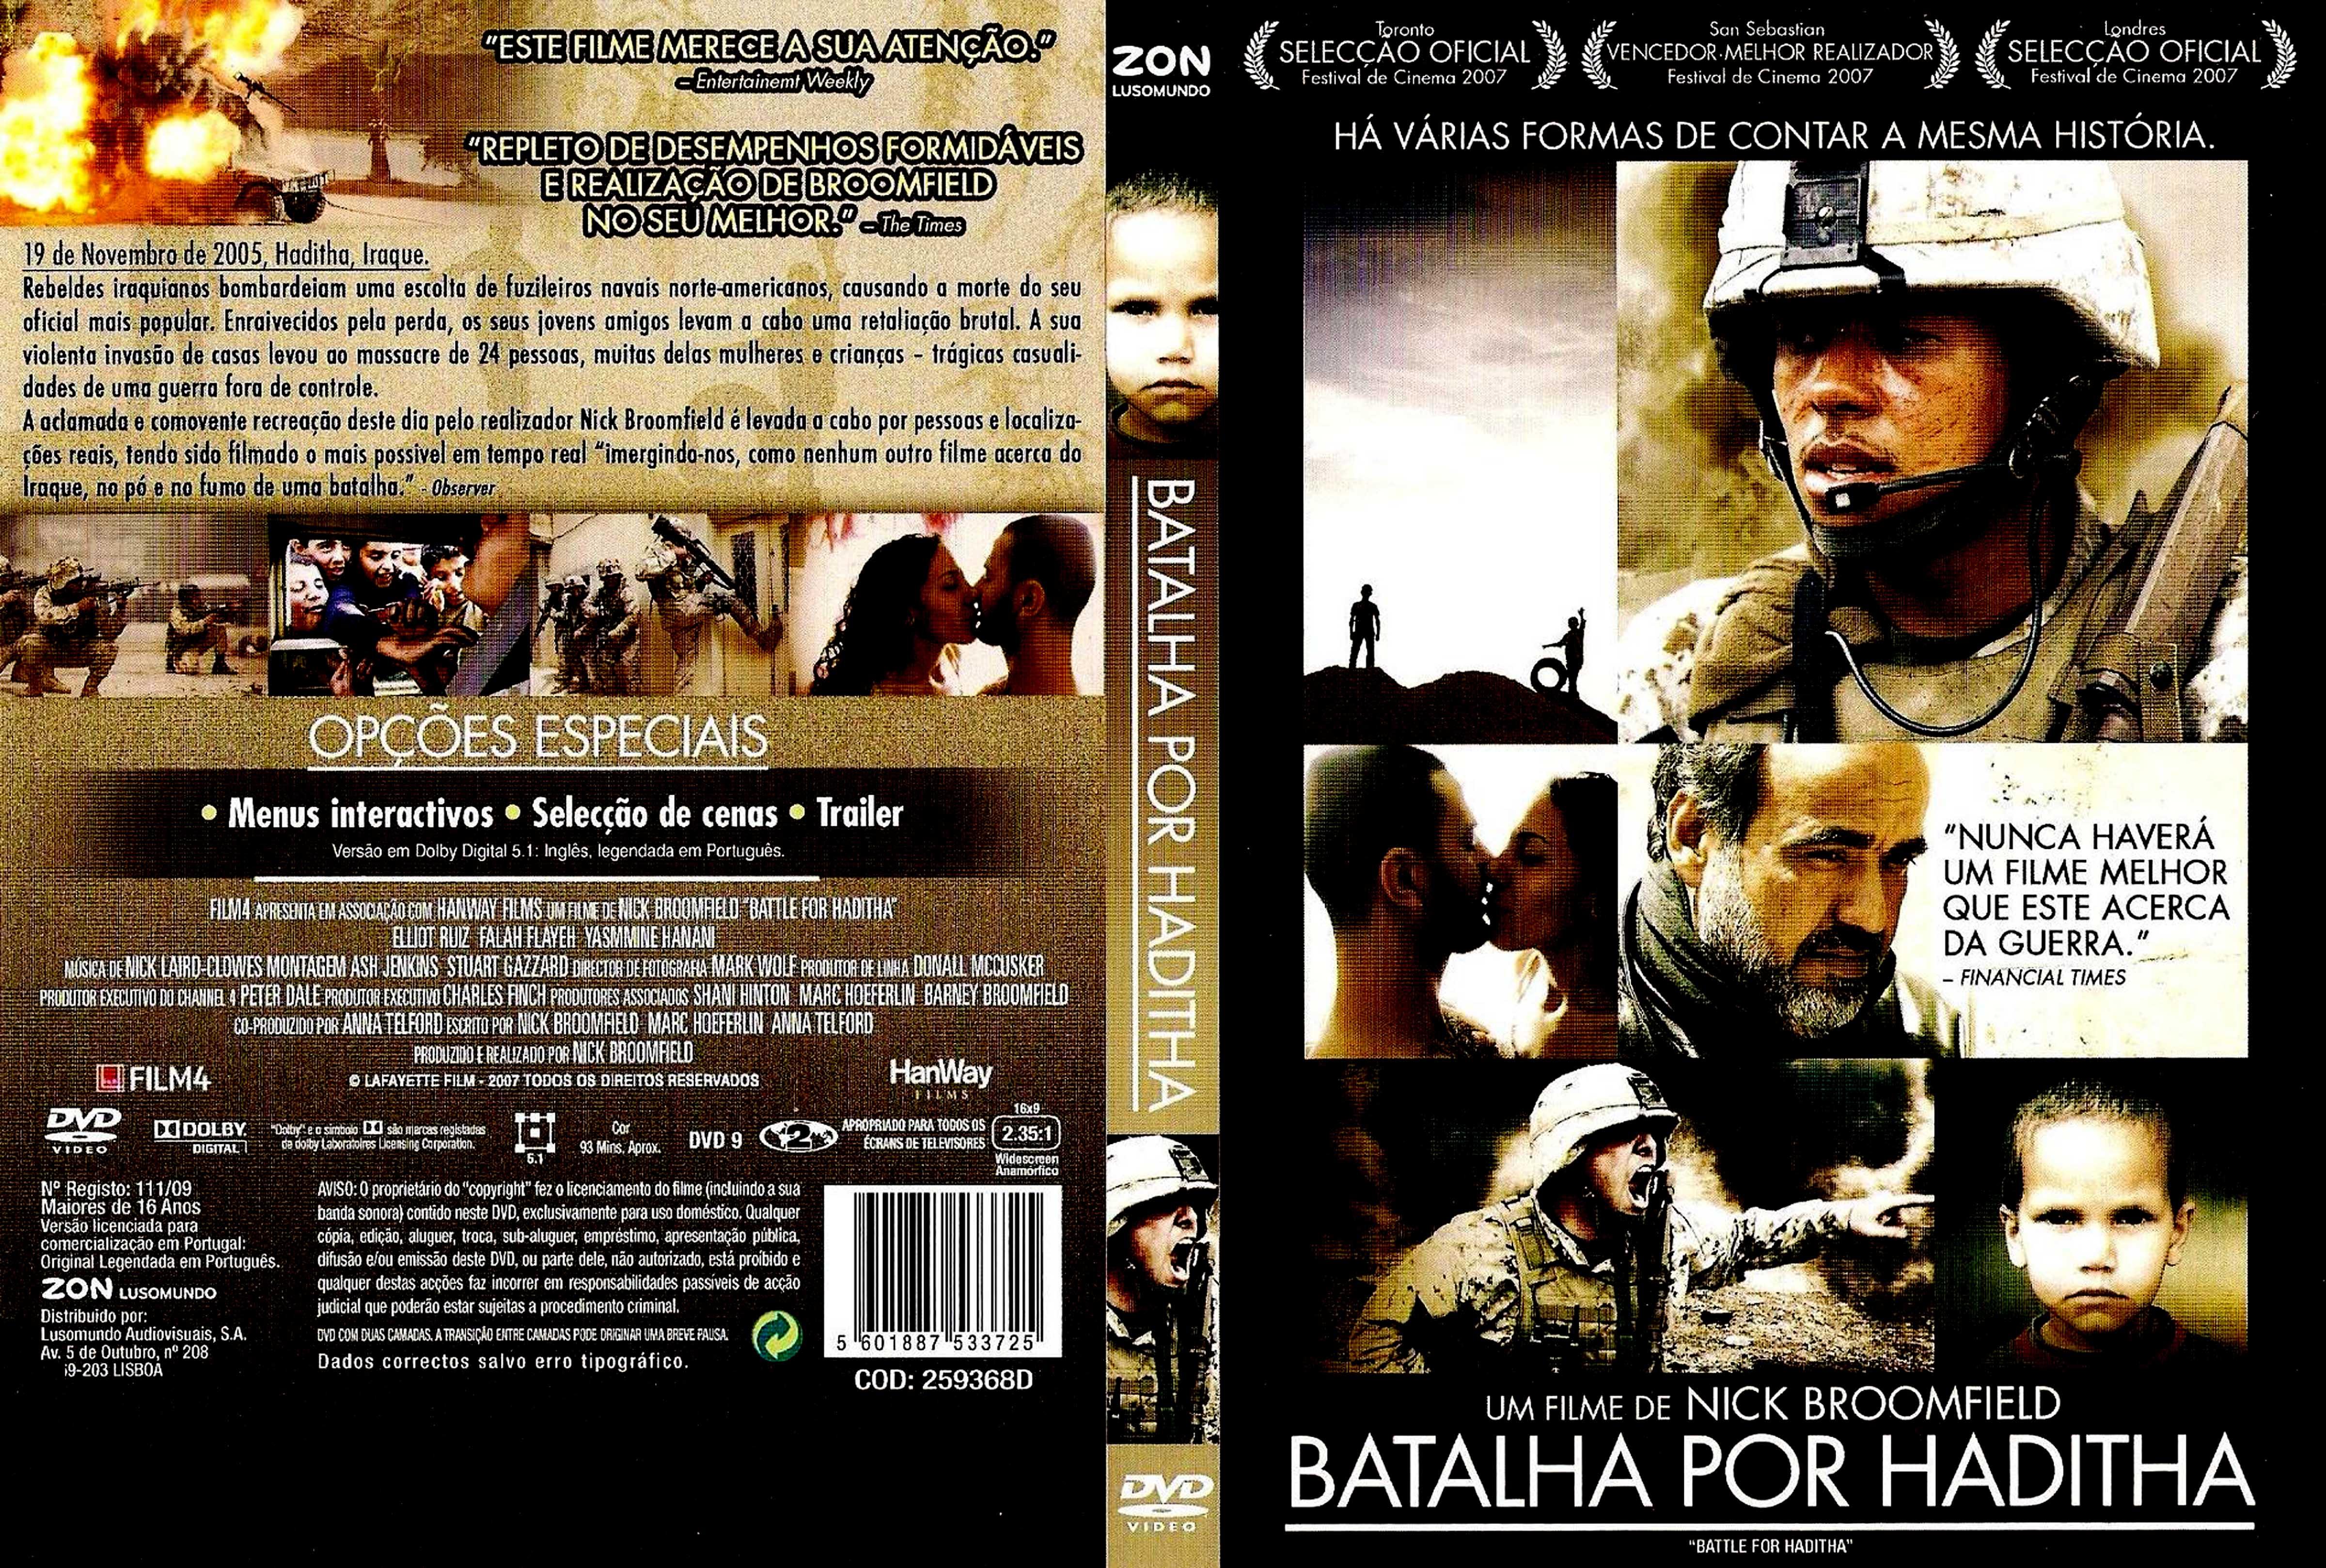 BatalhaporHaditha